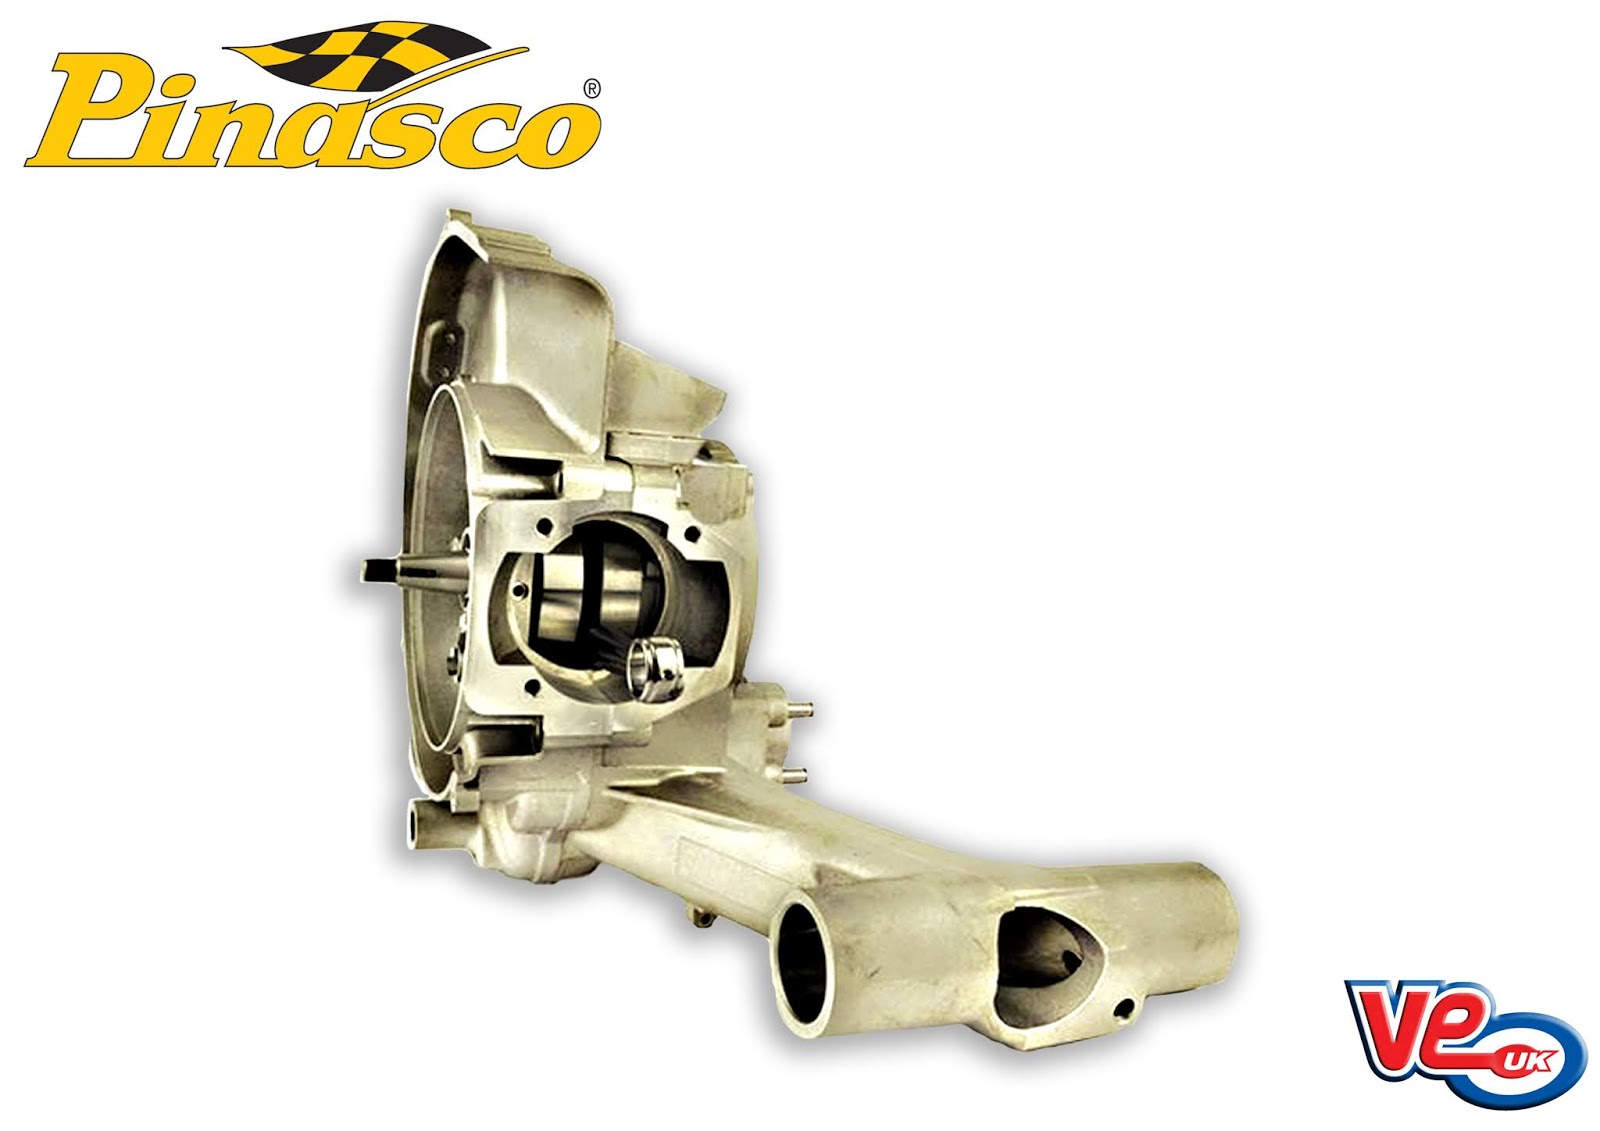 Pinasco Vespa Large Frame 250cc Crankcase